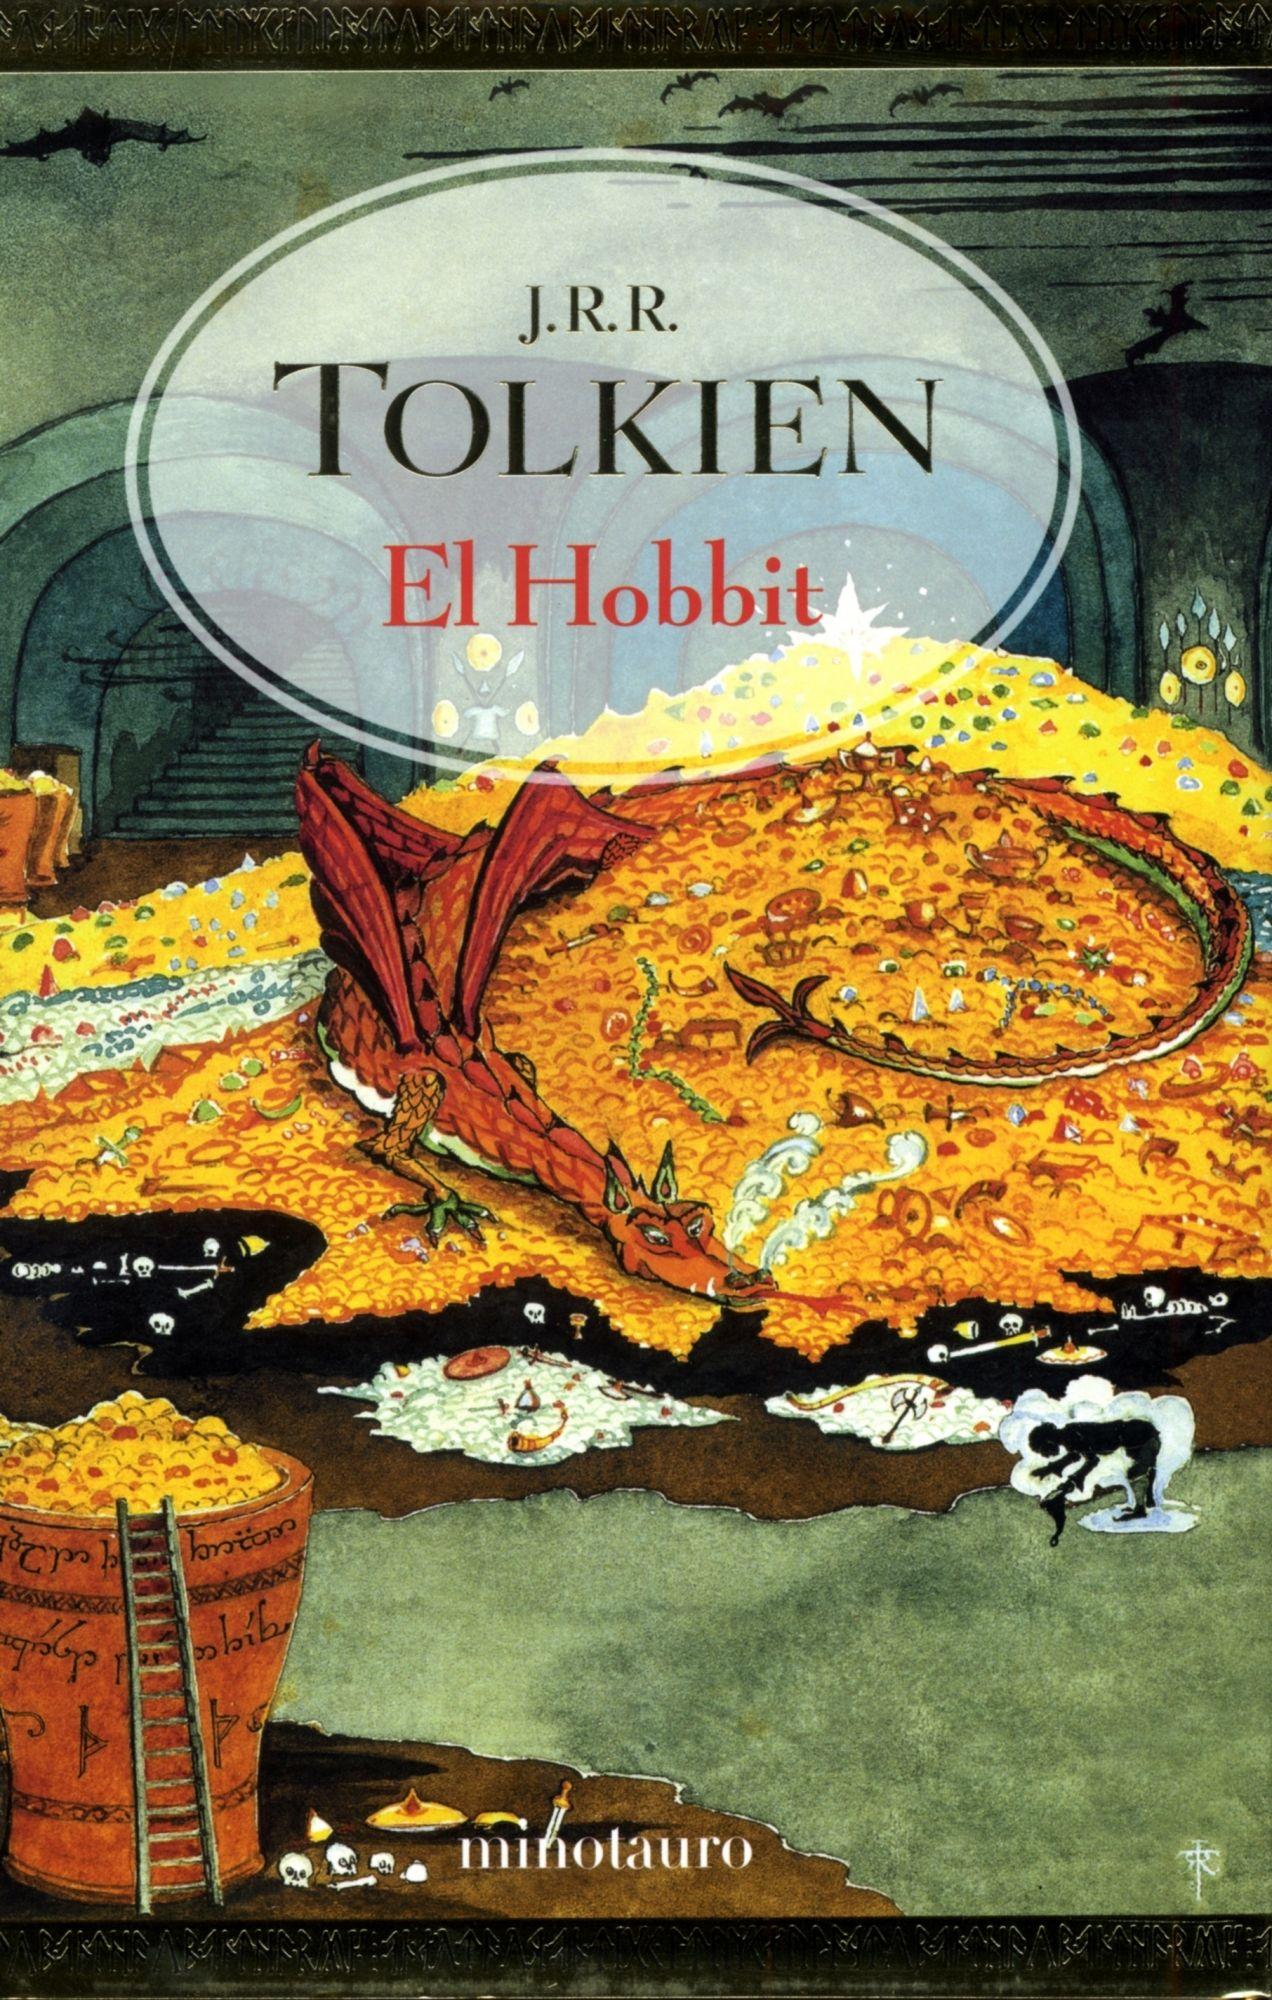 El Hobbit. El Hobbit. J. R. R. Tolkien